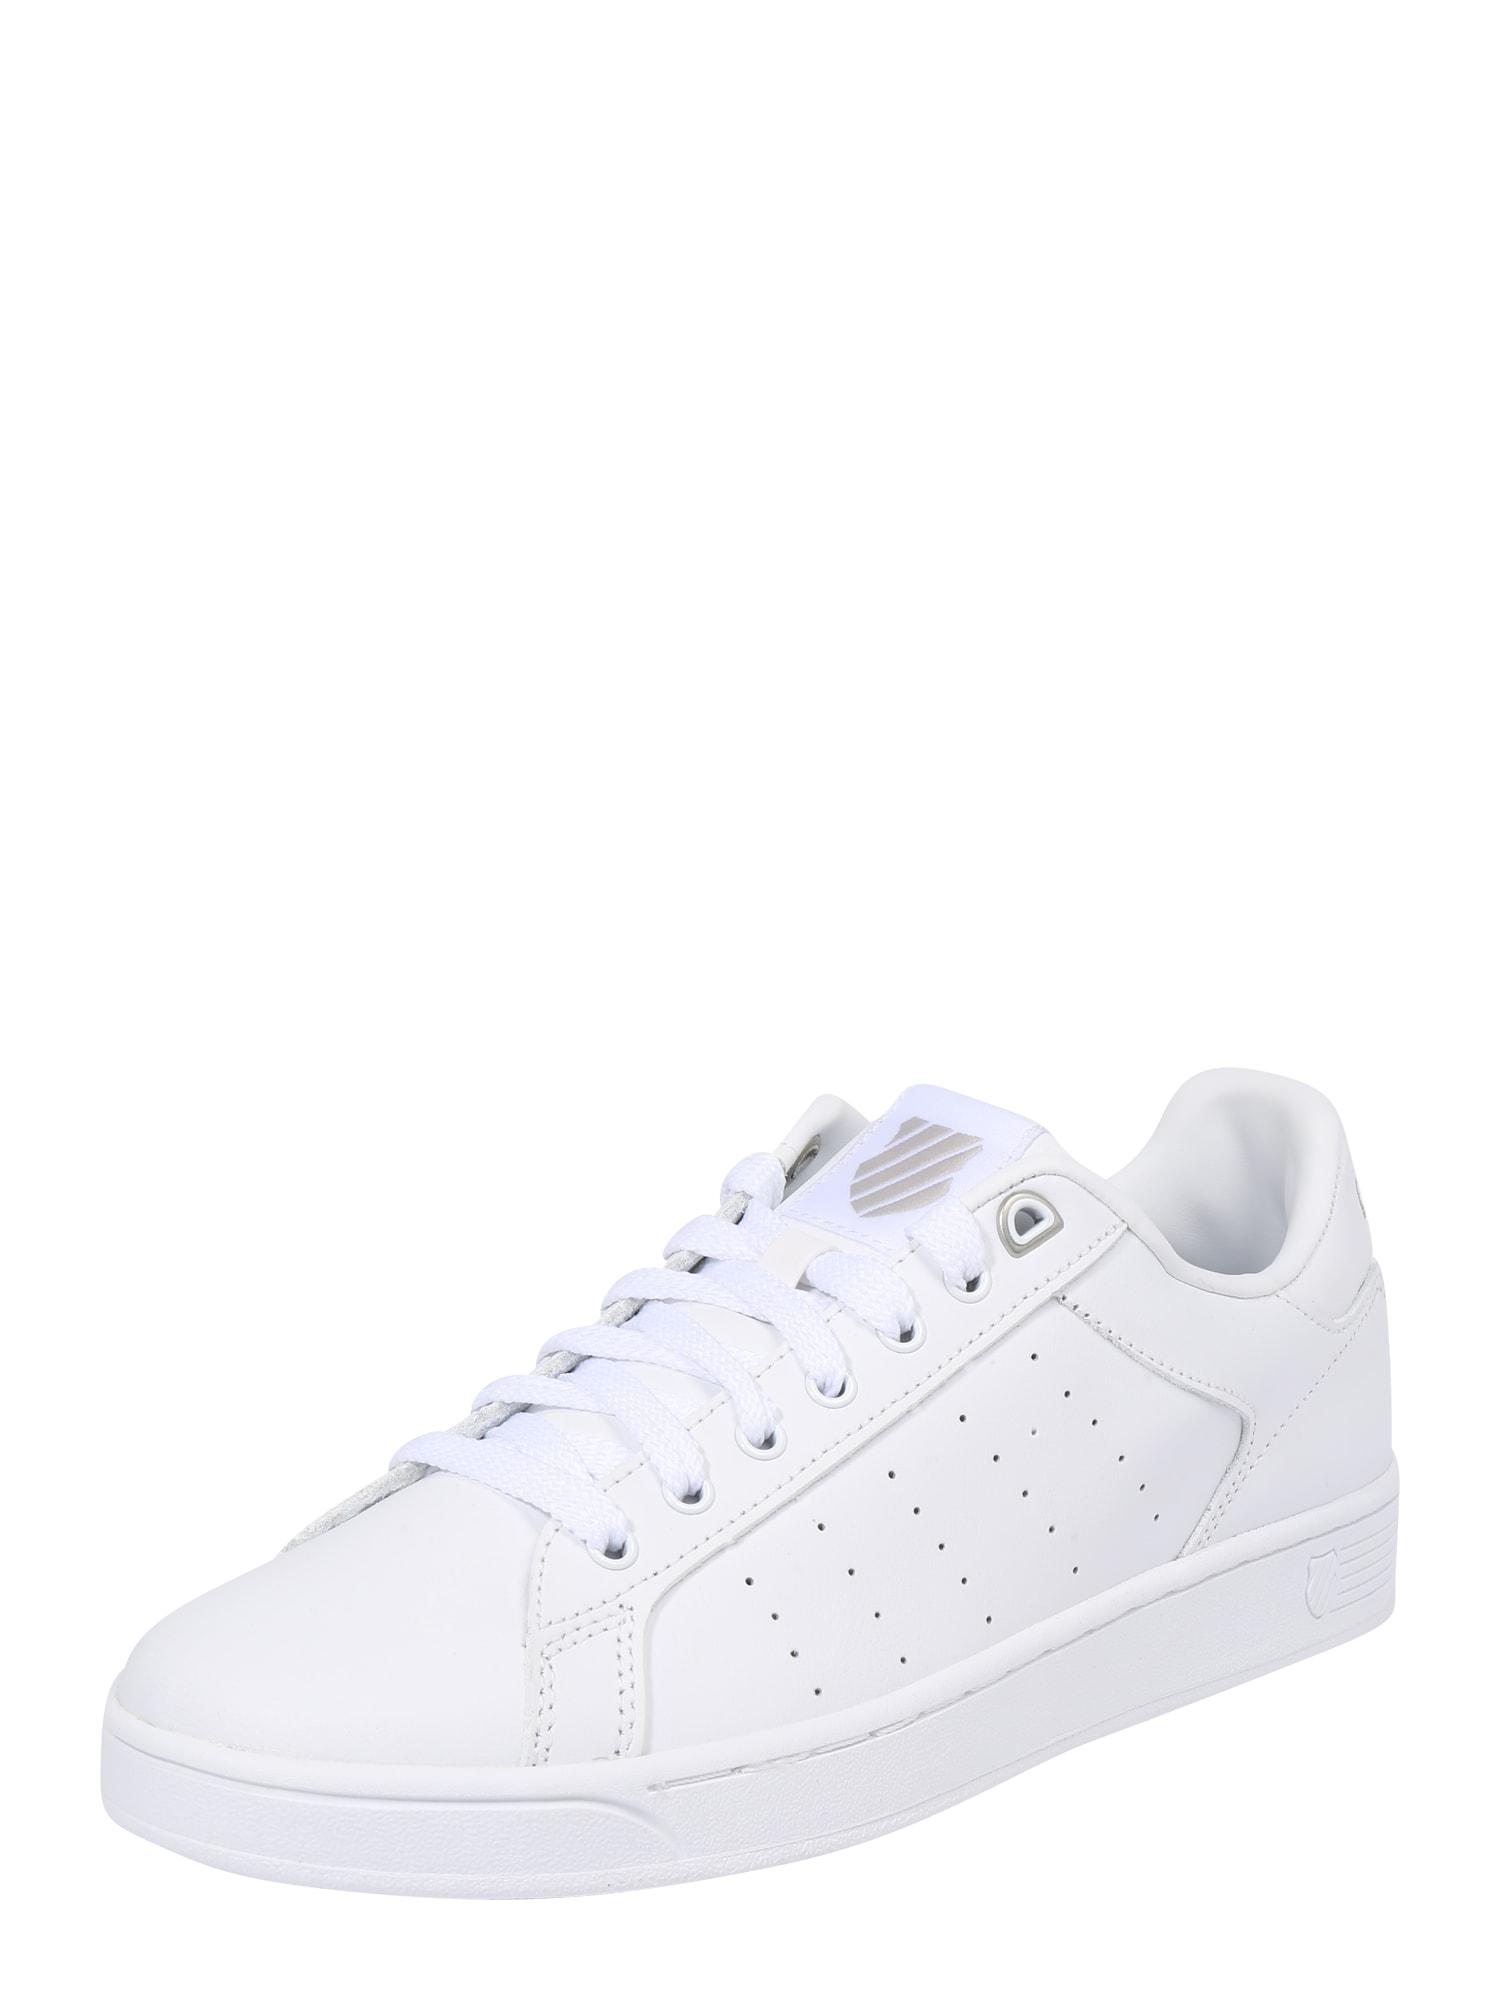 Tenisky Clean Court CMF M šedá bílá K-SWISS